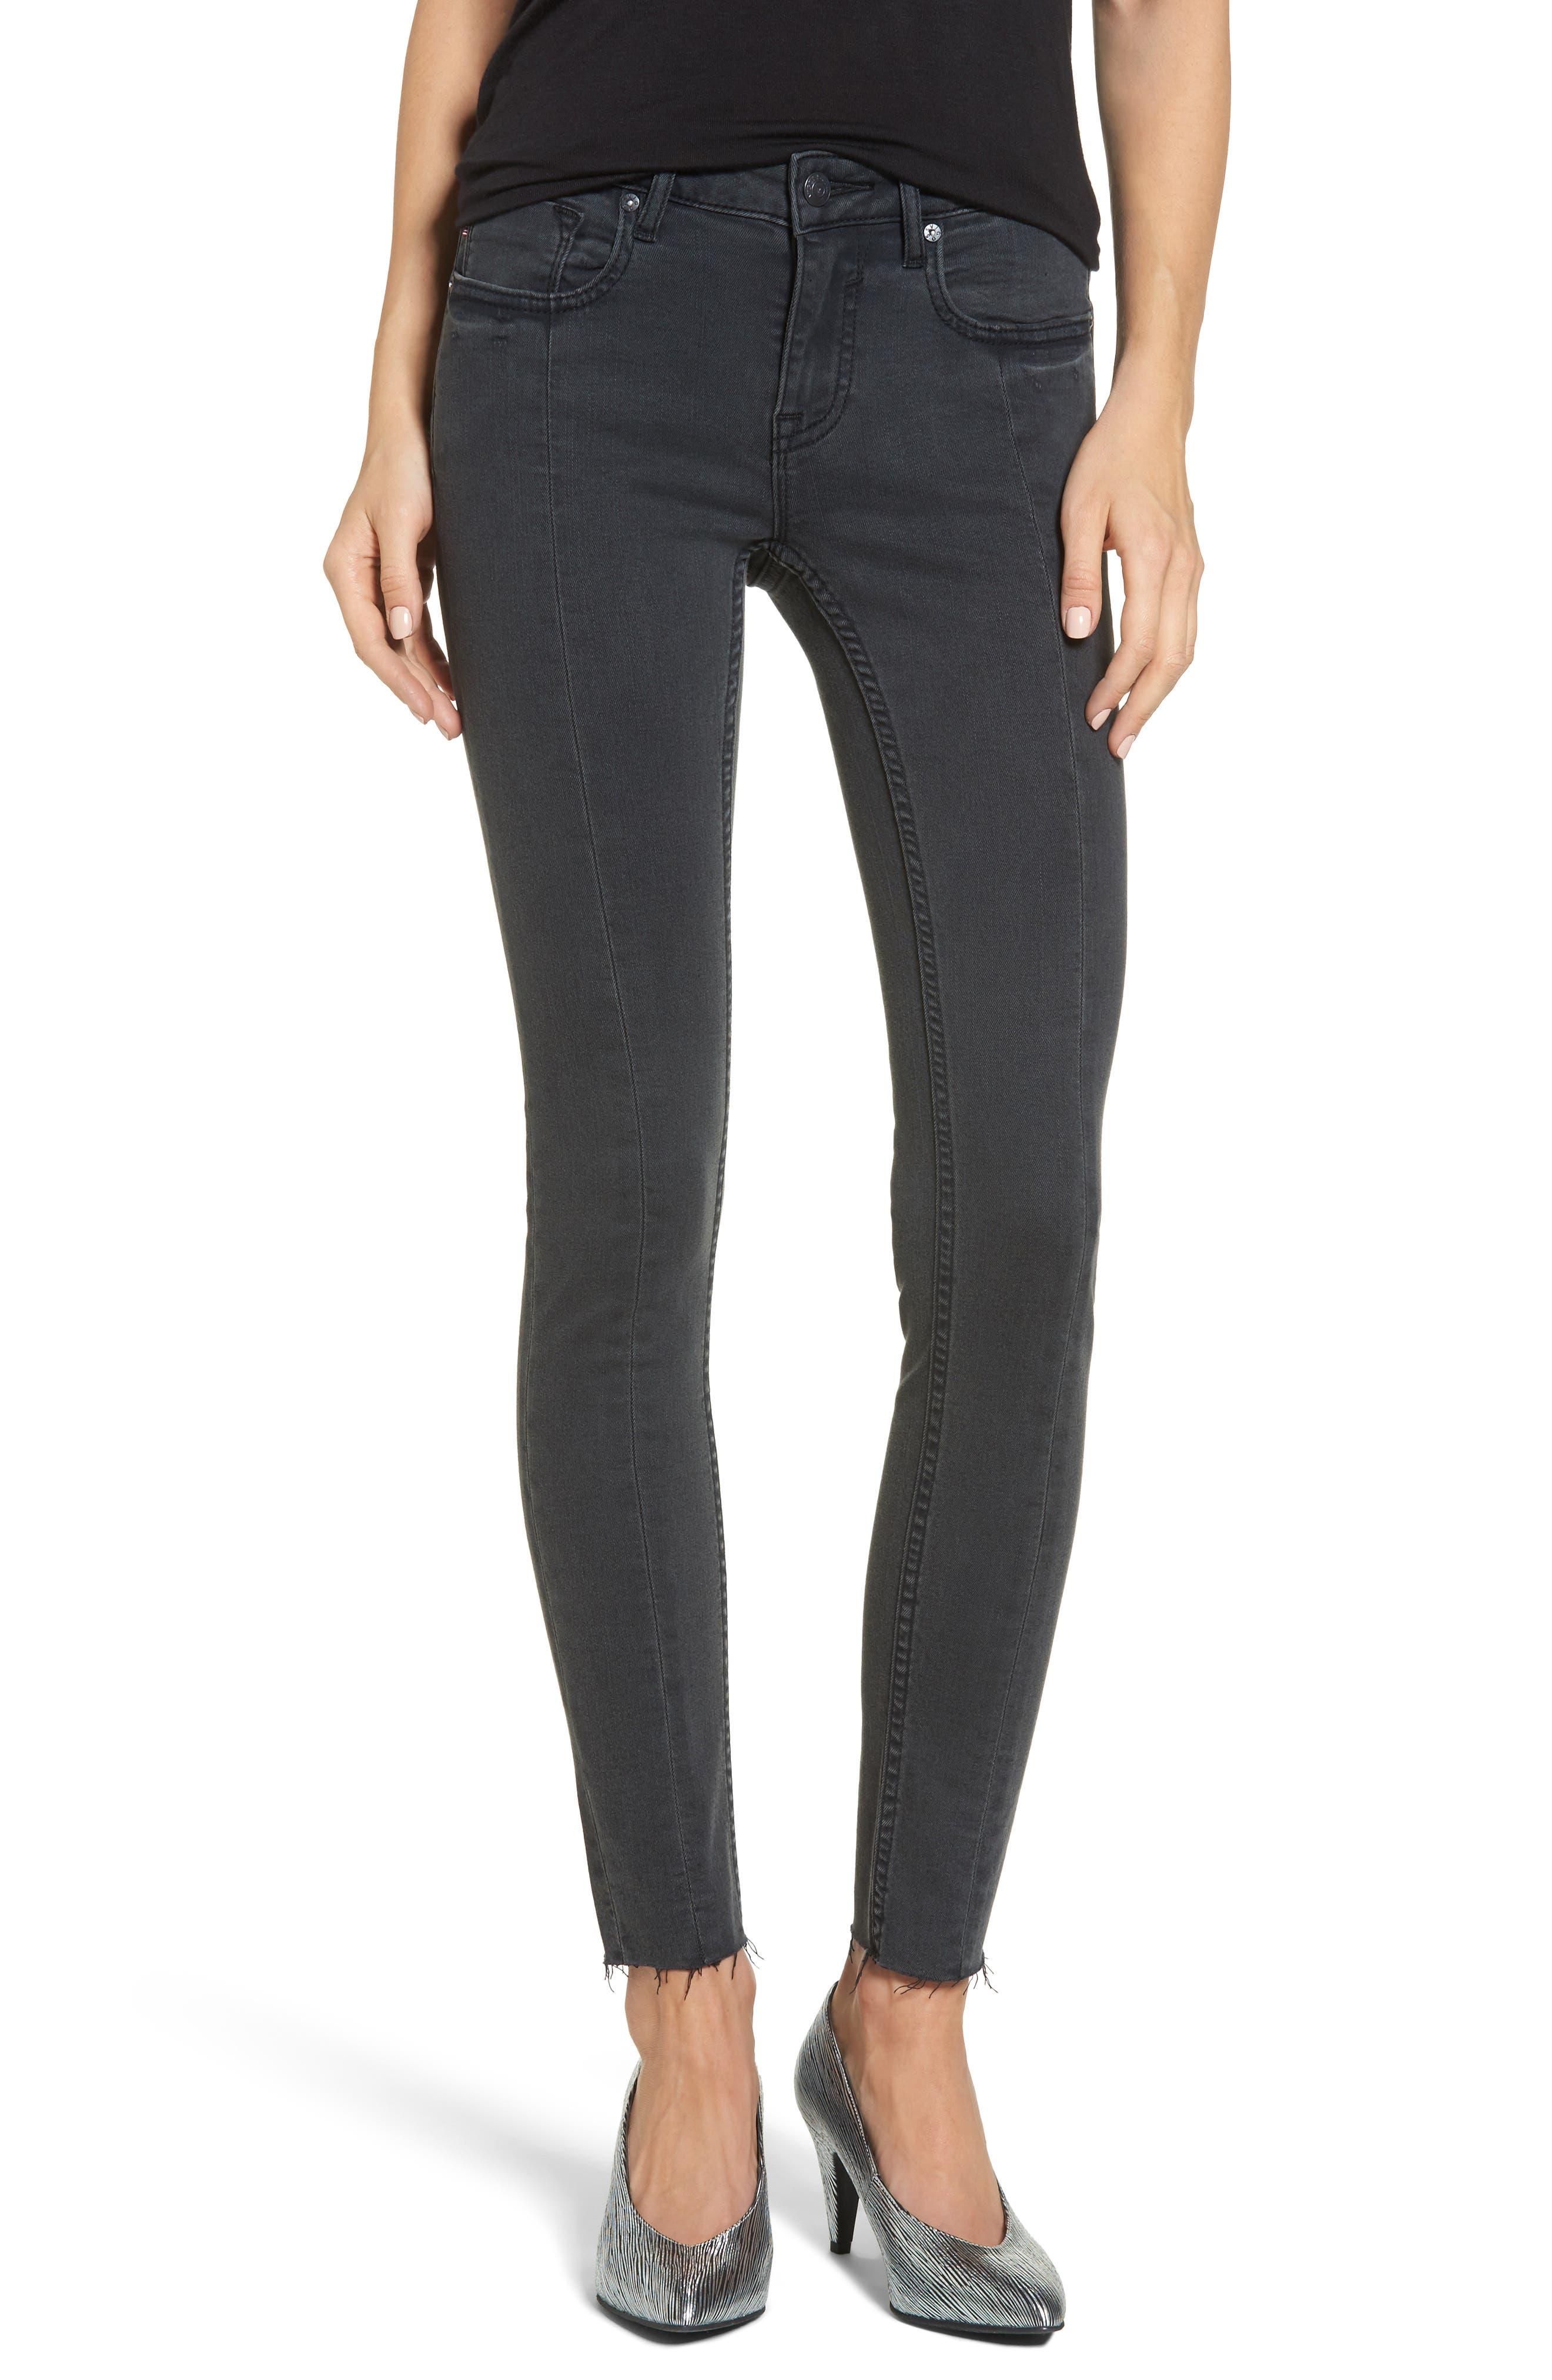 Alternate Image 1 Selected - Vigoss Jagger Front Seam Skinny Jeans